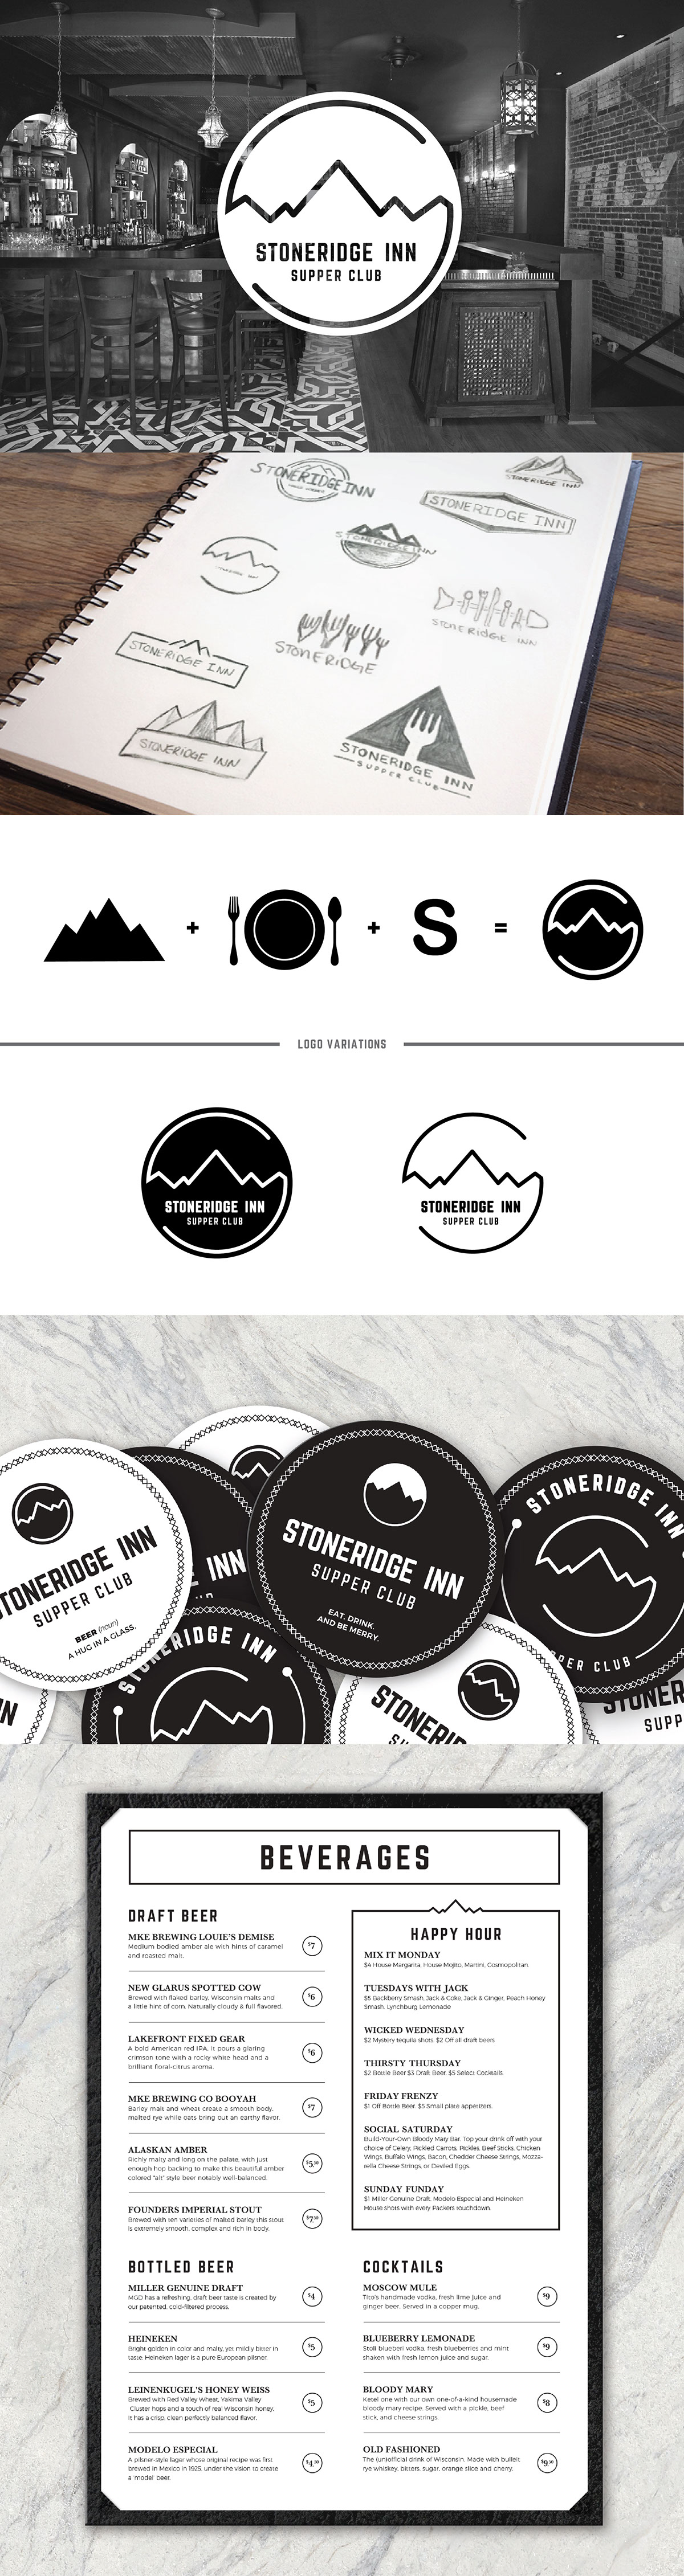 stoneridge supper club restaurant logo Coasters menu mountains black and white